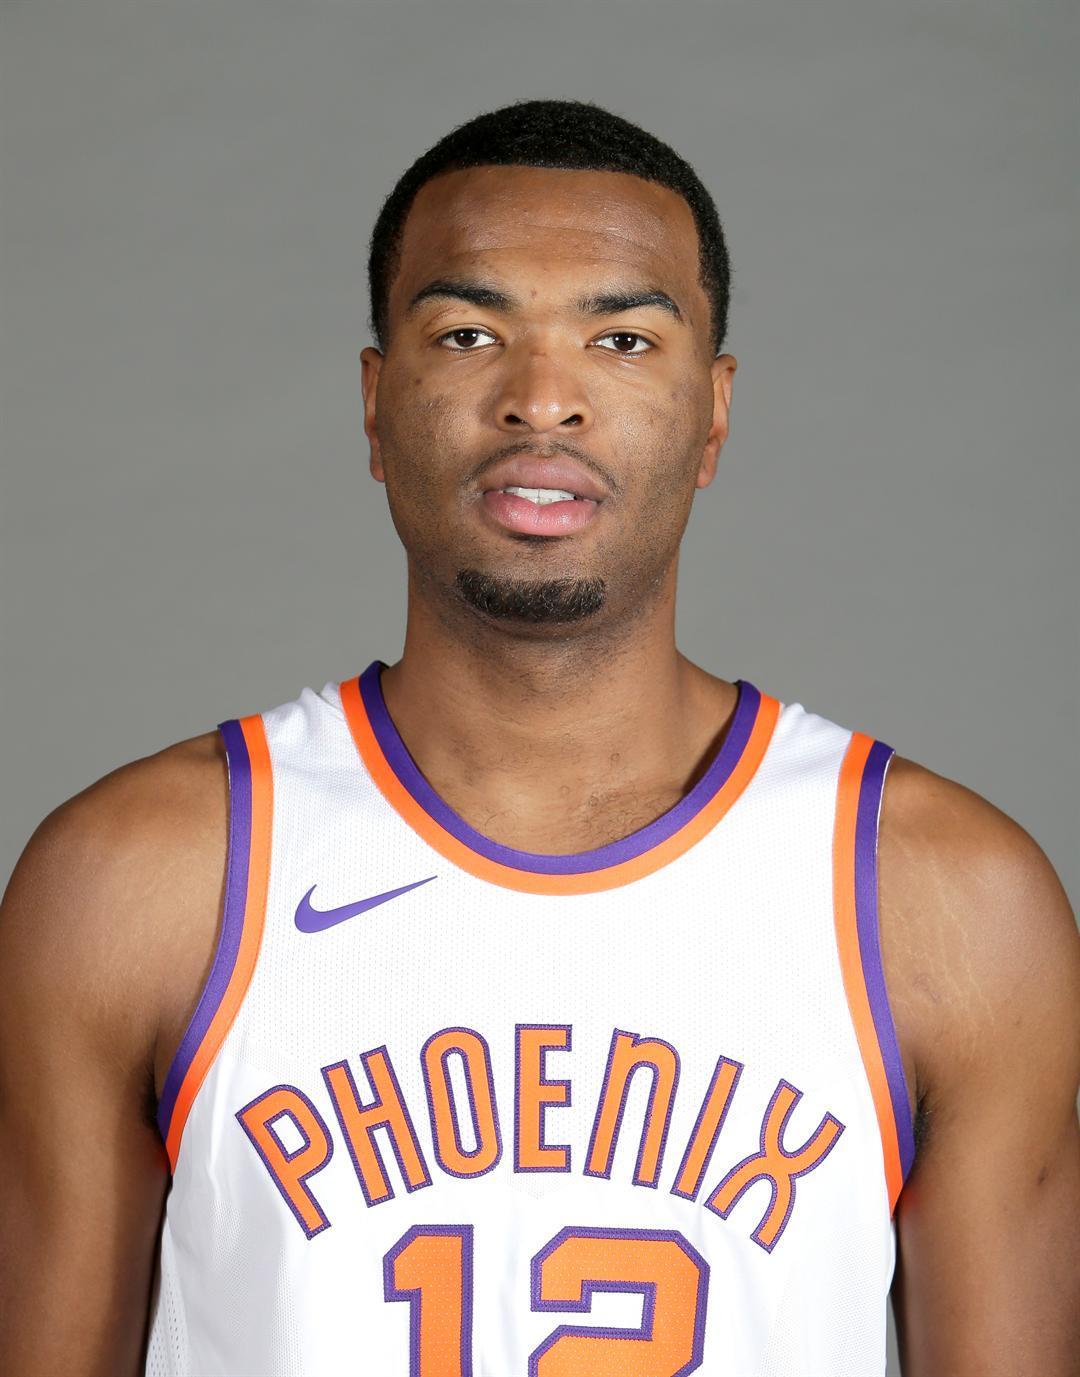 Phoenix Suns TJ Warren poses during the NBA basketball team media day Monday, Sept. 25, 2017 in Phoenix. (Source: AP Photo/Rick Scuteri)